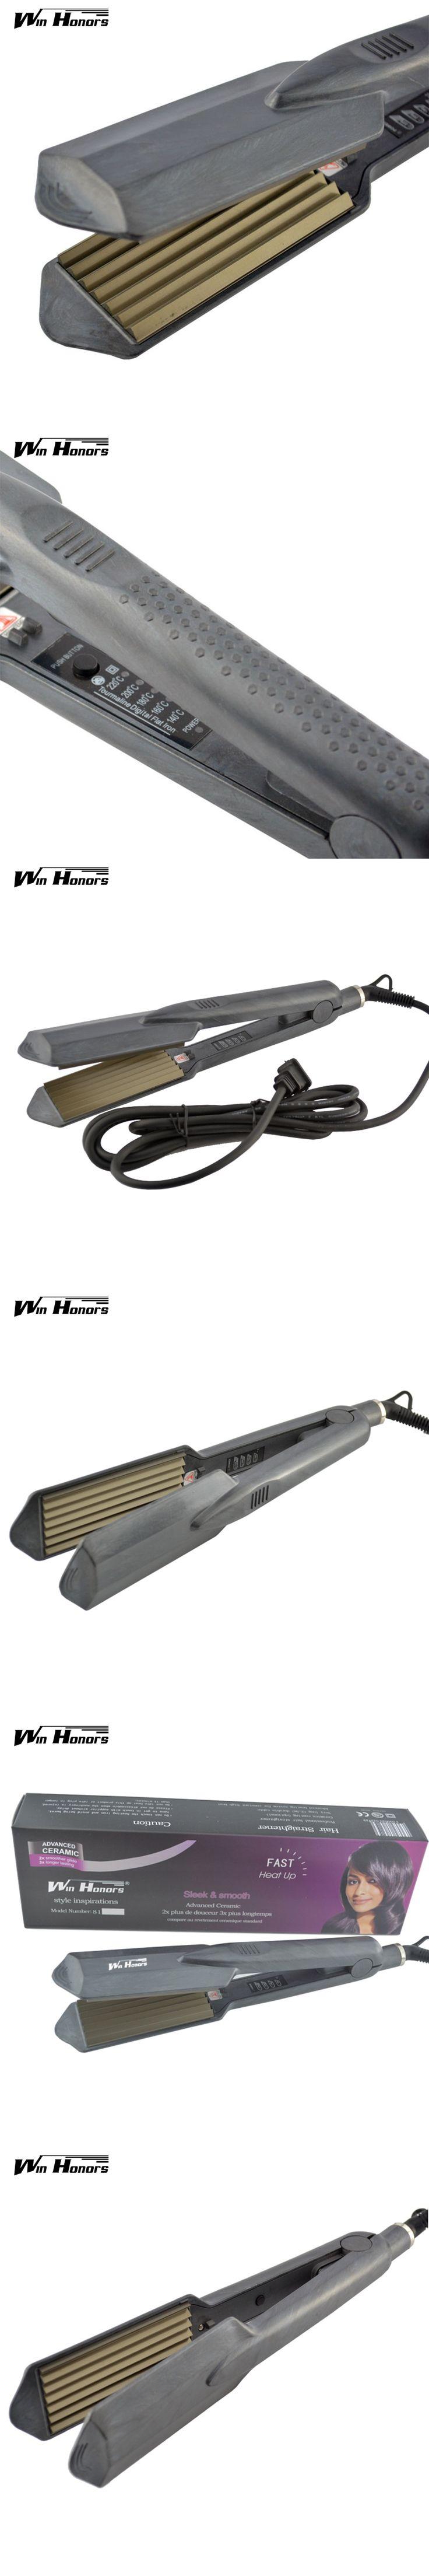 2015 Titanium Hair Crimper Straightener Irons Fluffy Styling Hair Iron Volume for Corrugated Corn Plates Ripple Machine